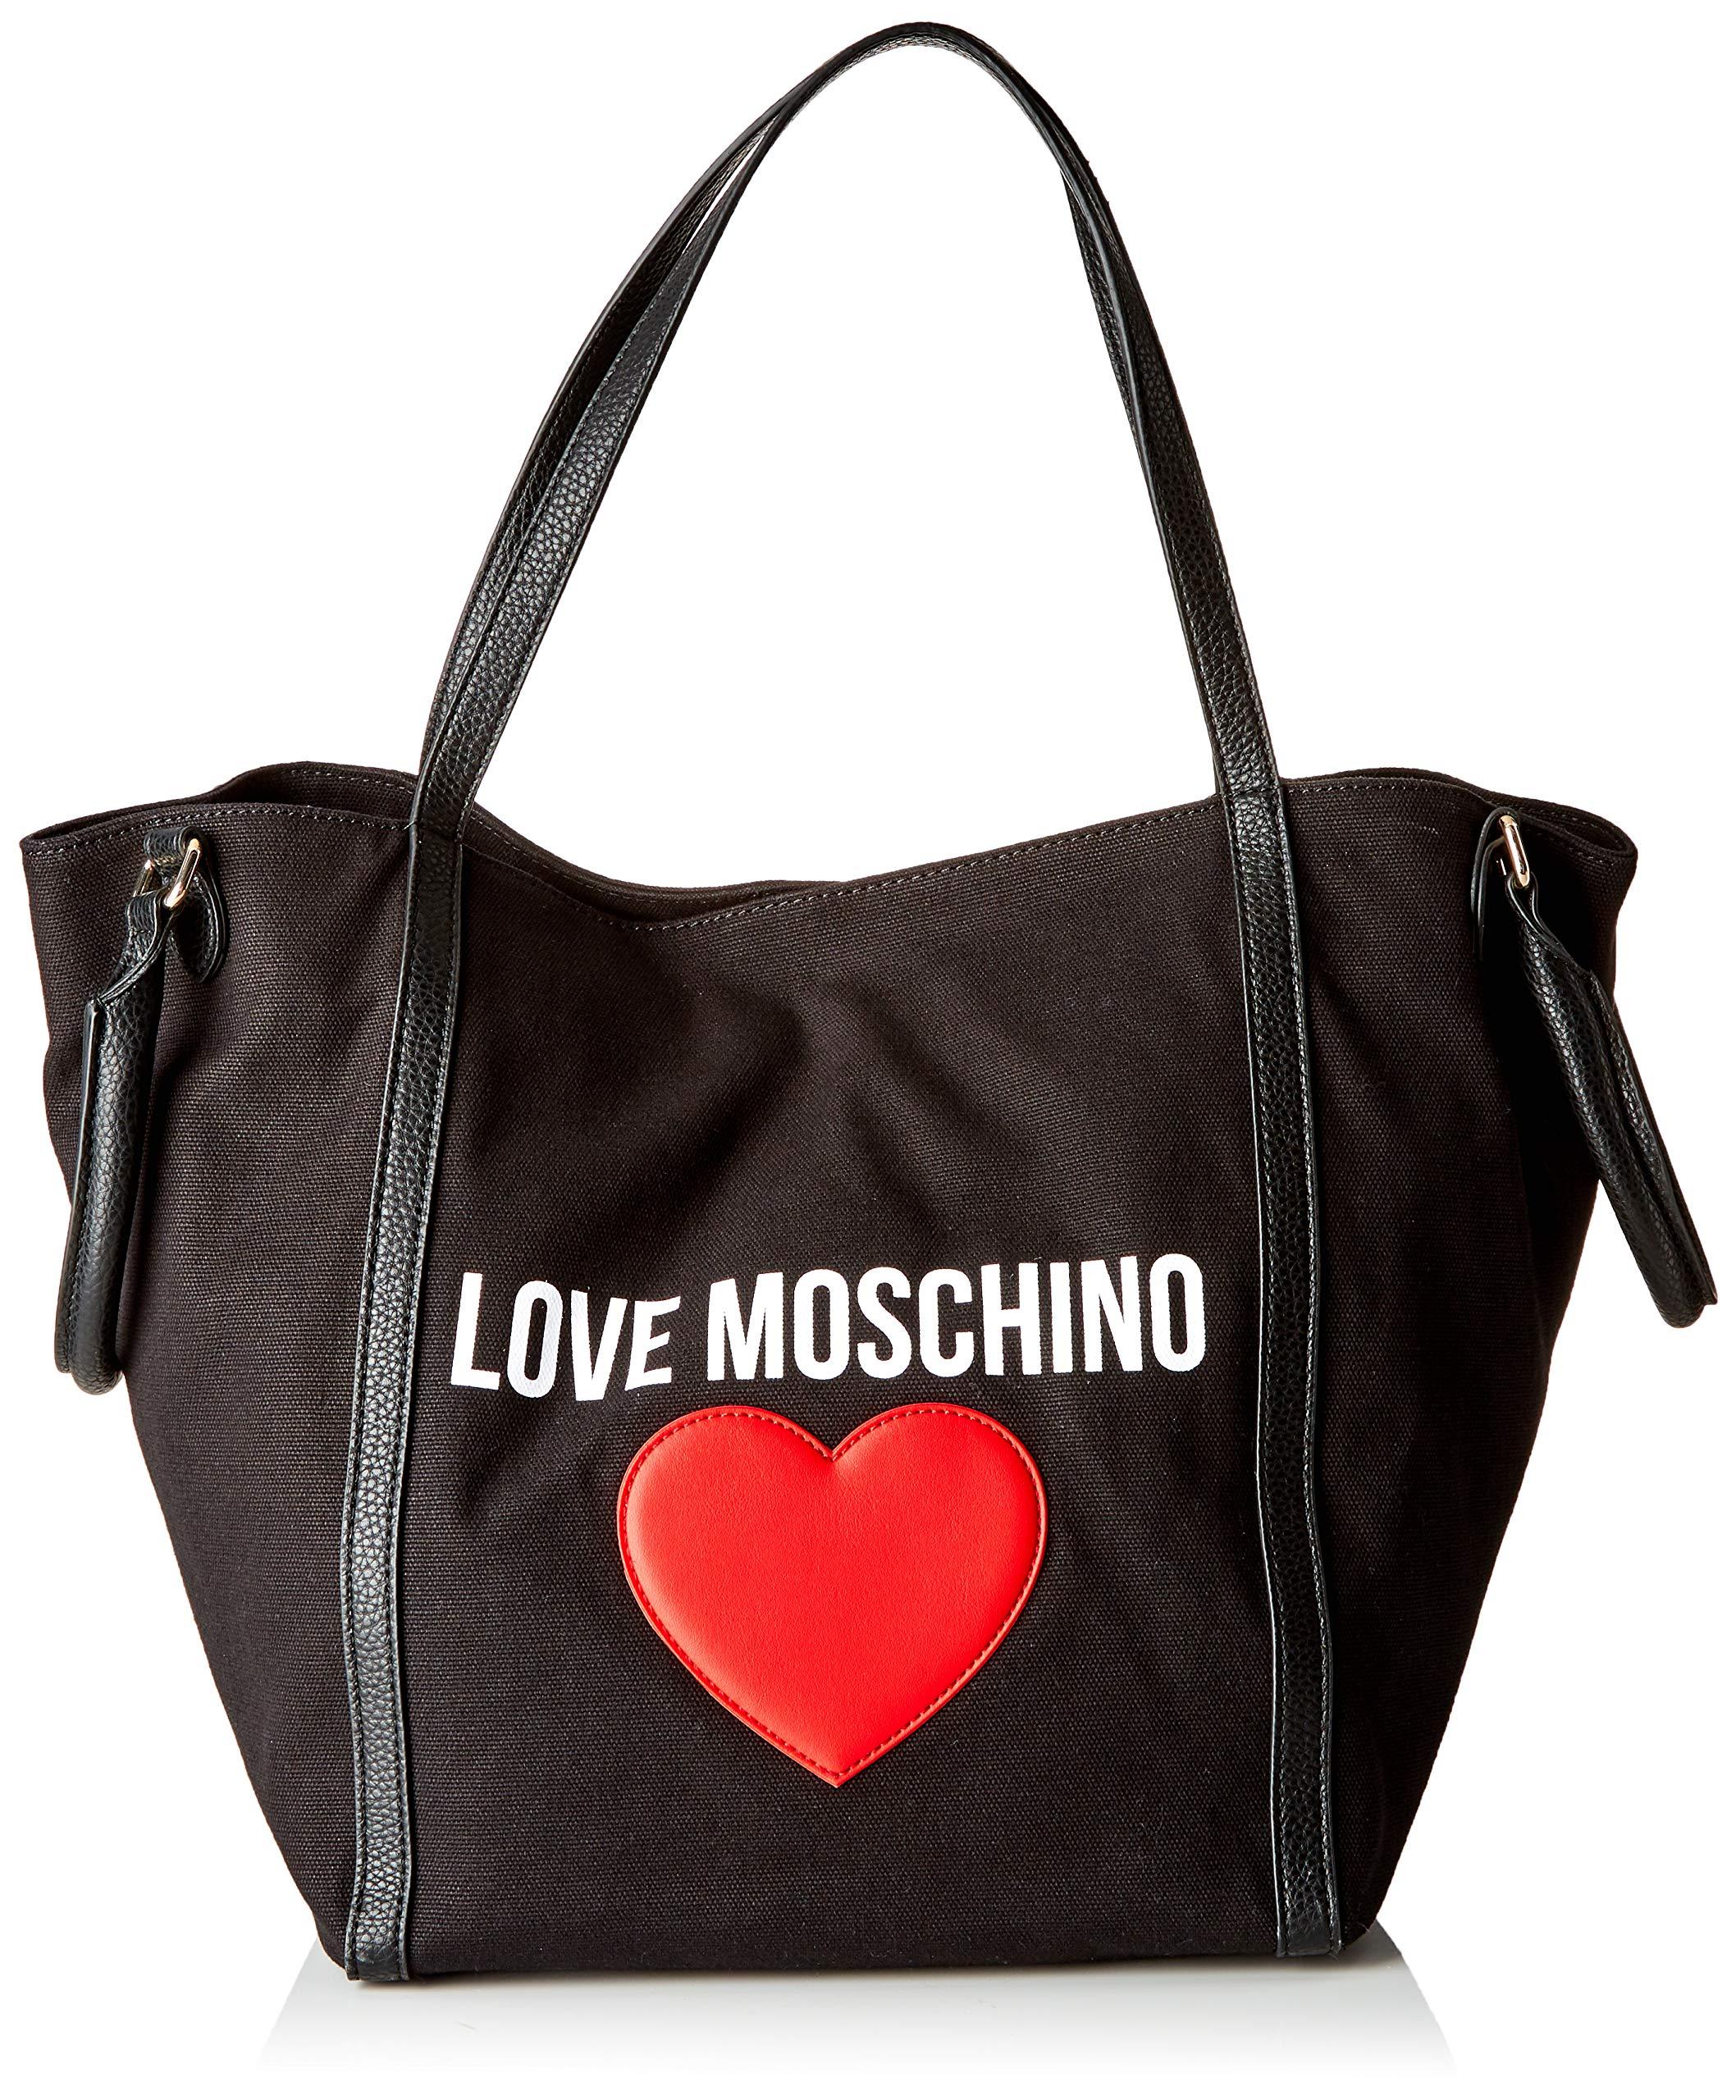 Love Moschino X E Canvas Cmw Pebble PuSac Main FemmeNoirnero20x32x46 L Porté Borsa H bgf6v7IYy